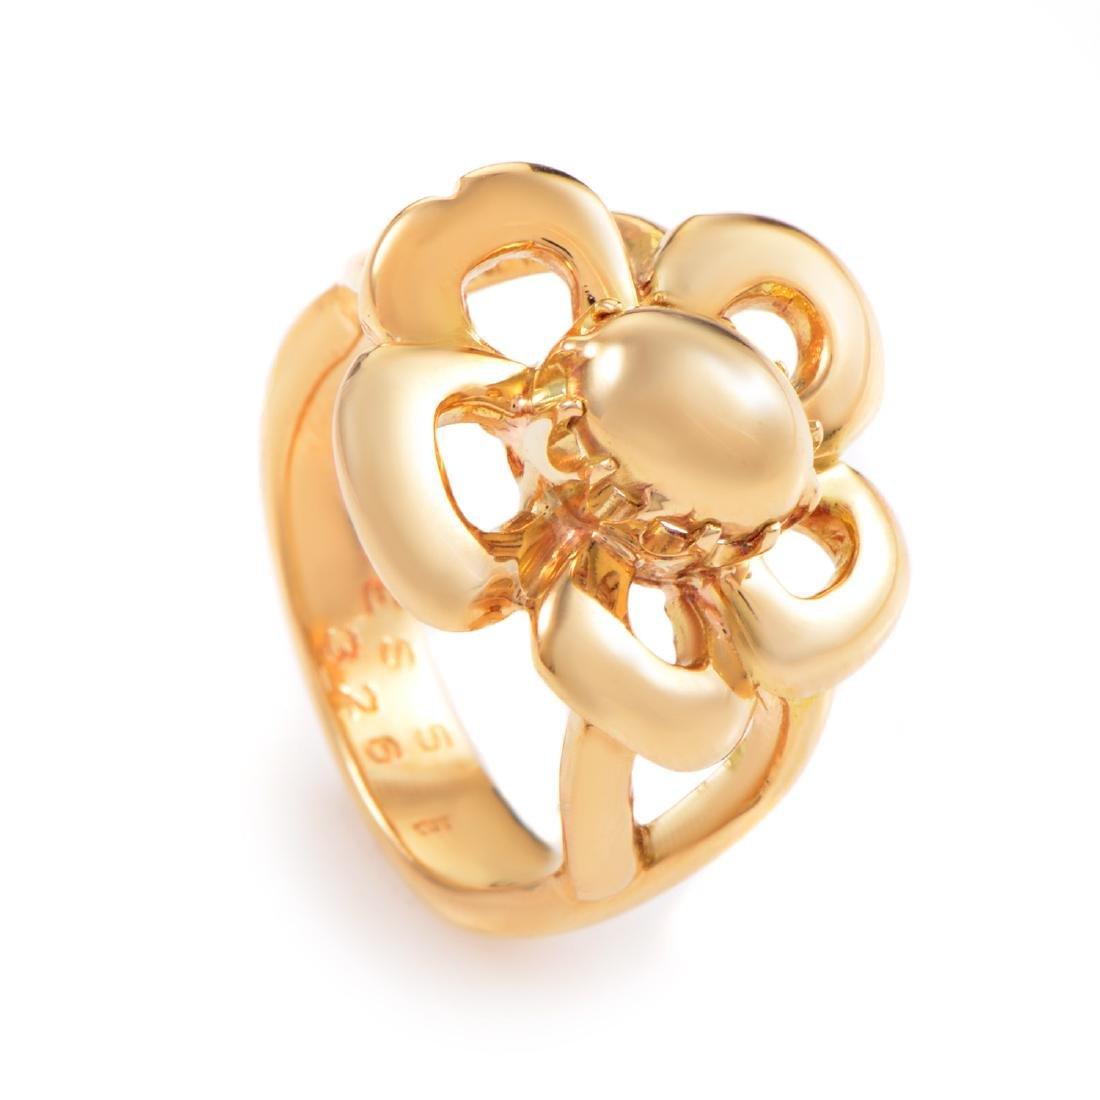 Hermès 18K Yellow Gold Flower Ring